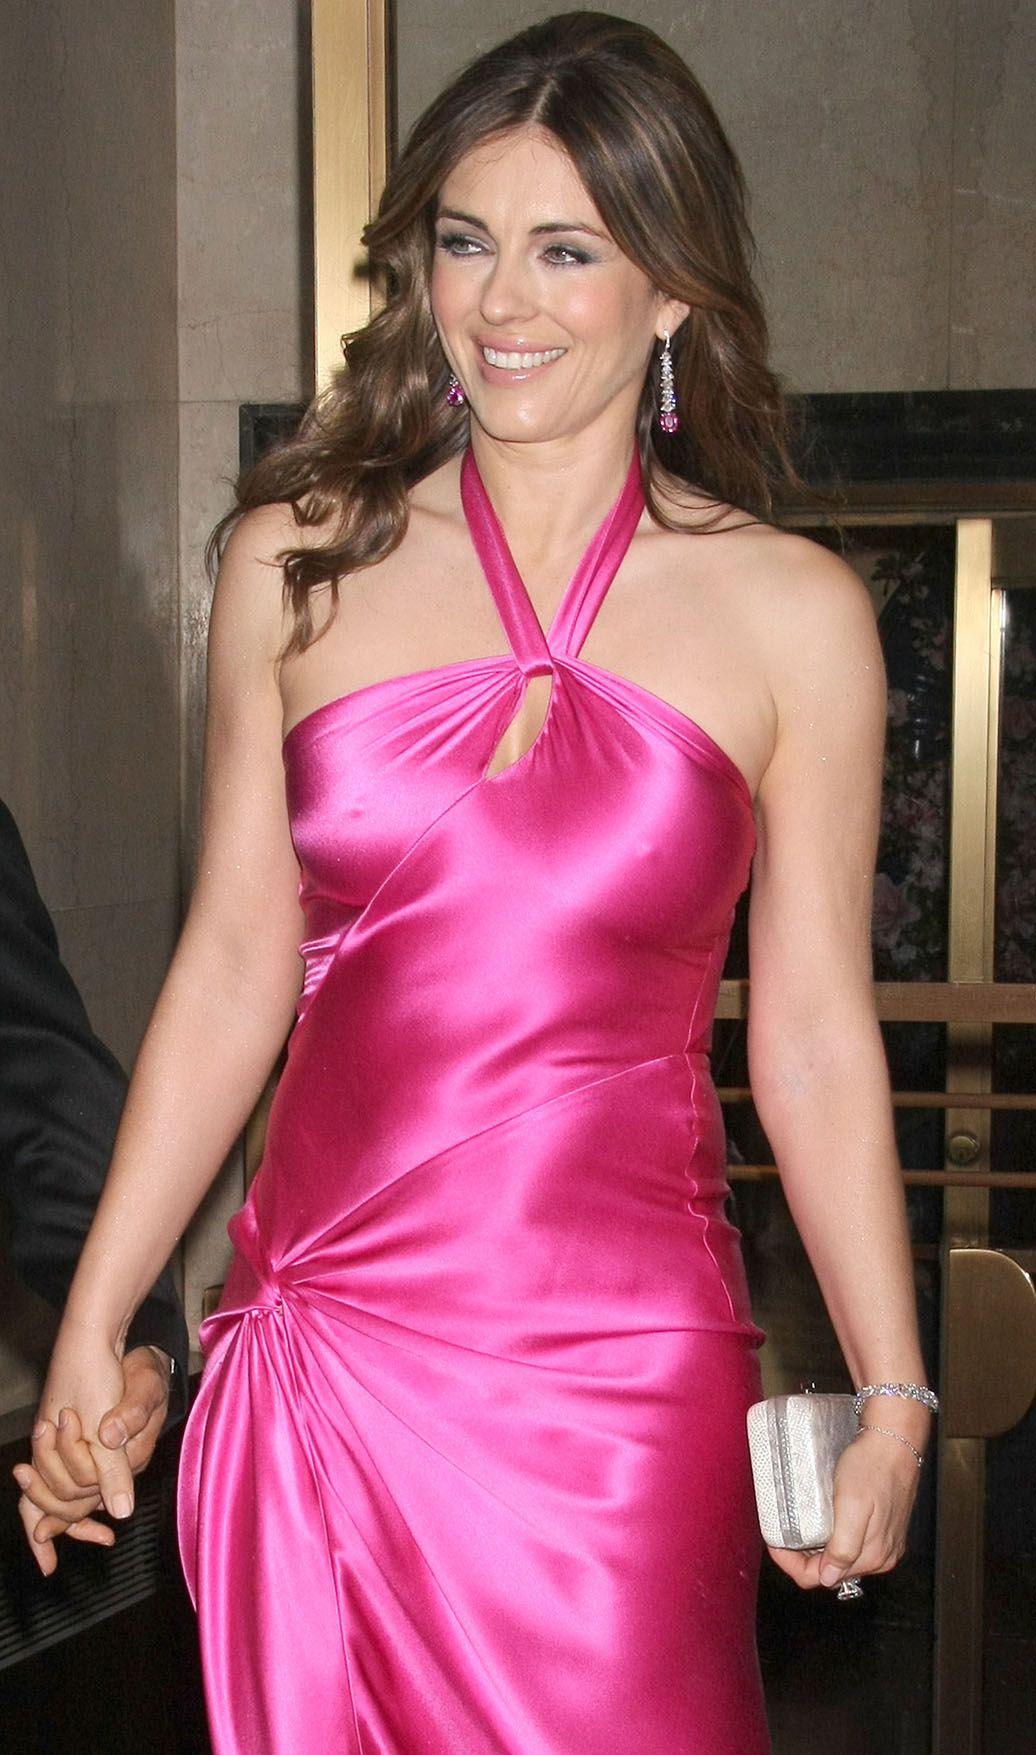 Elizabeth Hurley - pokies in a pink tight dress | dresses ...